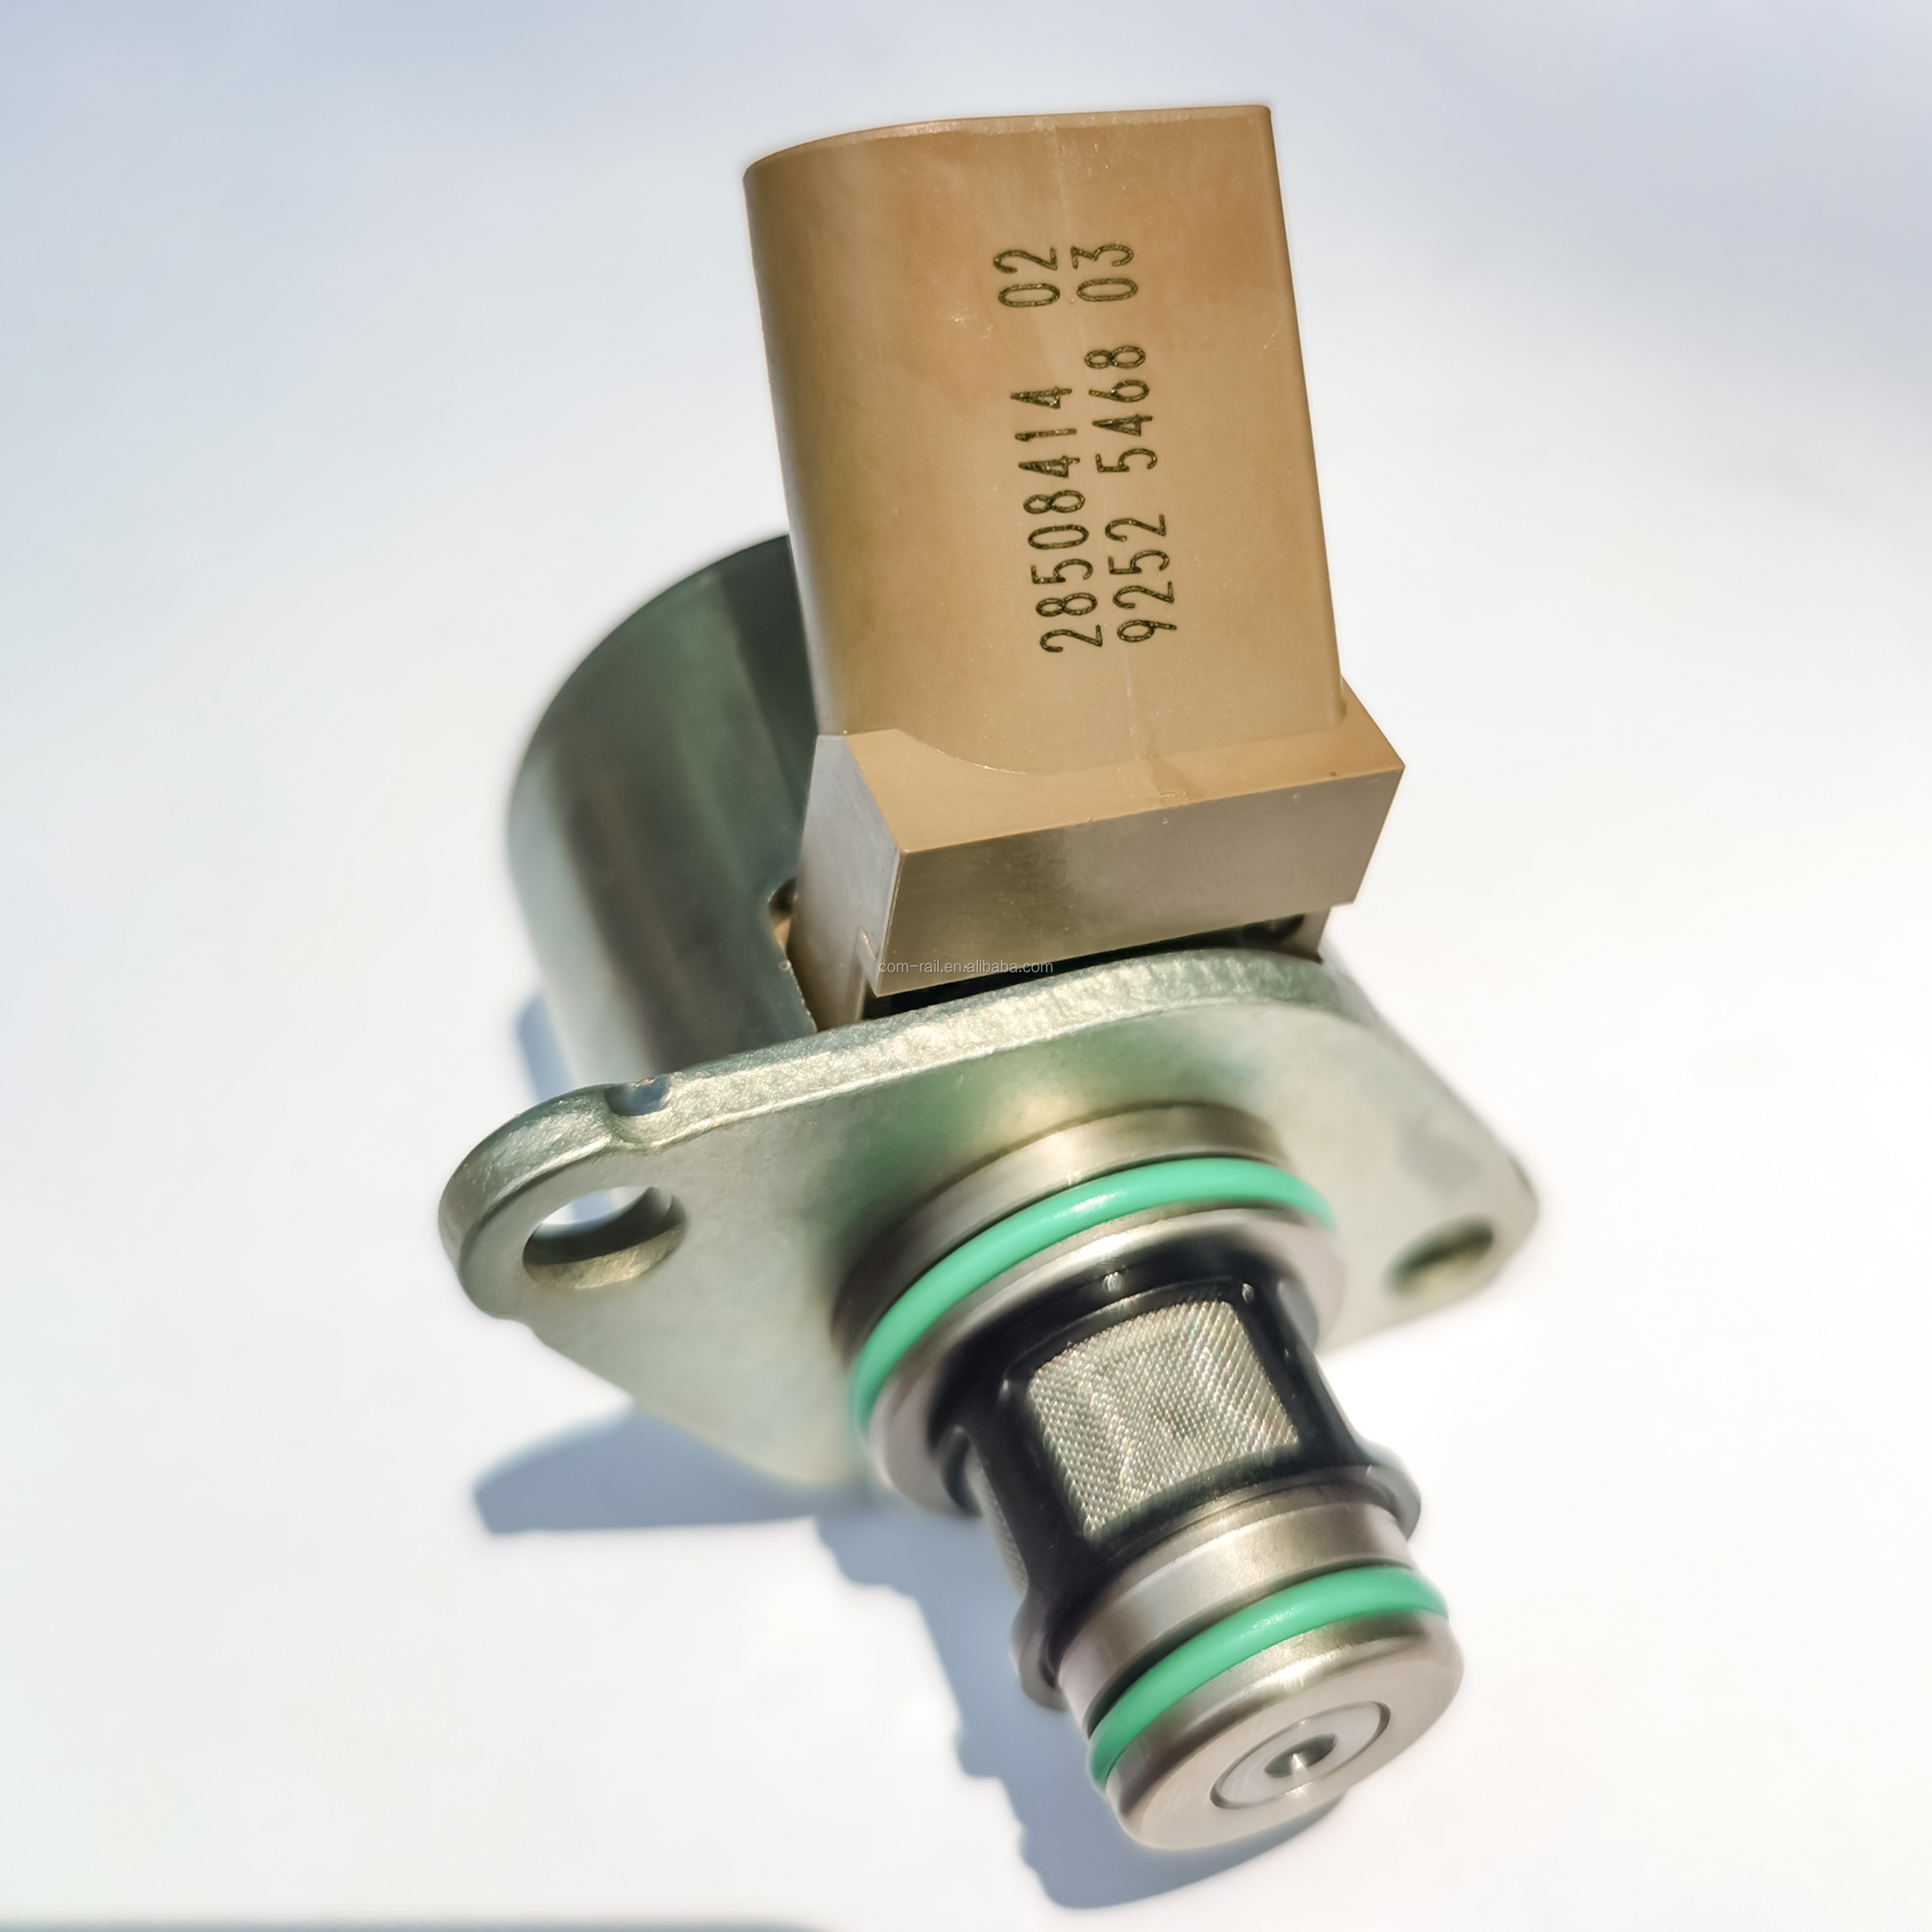 genuine common rail repair kit IMV valve 7135-818 for pump 33100-4X700 enlarge